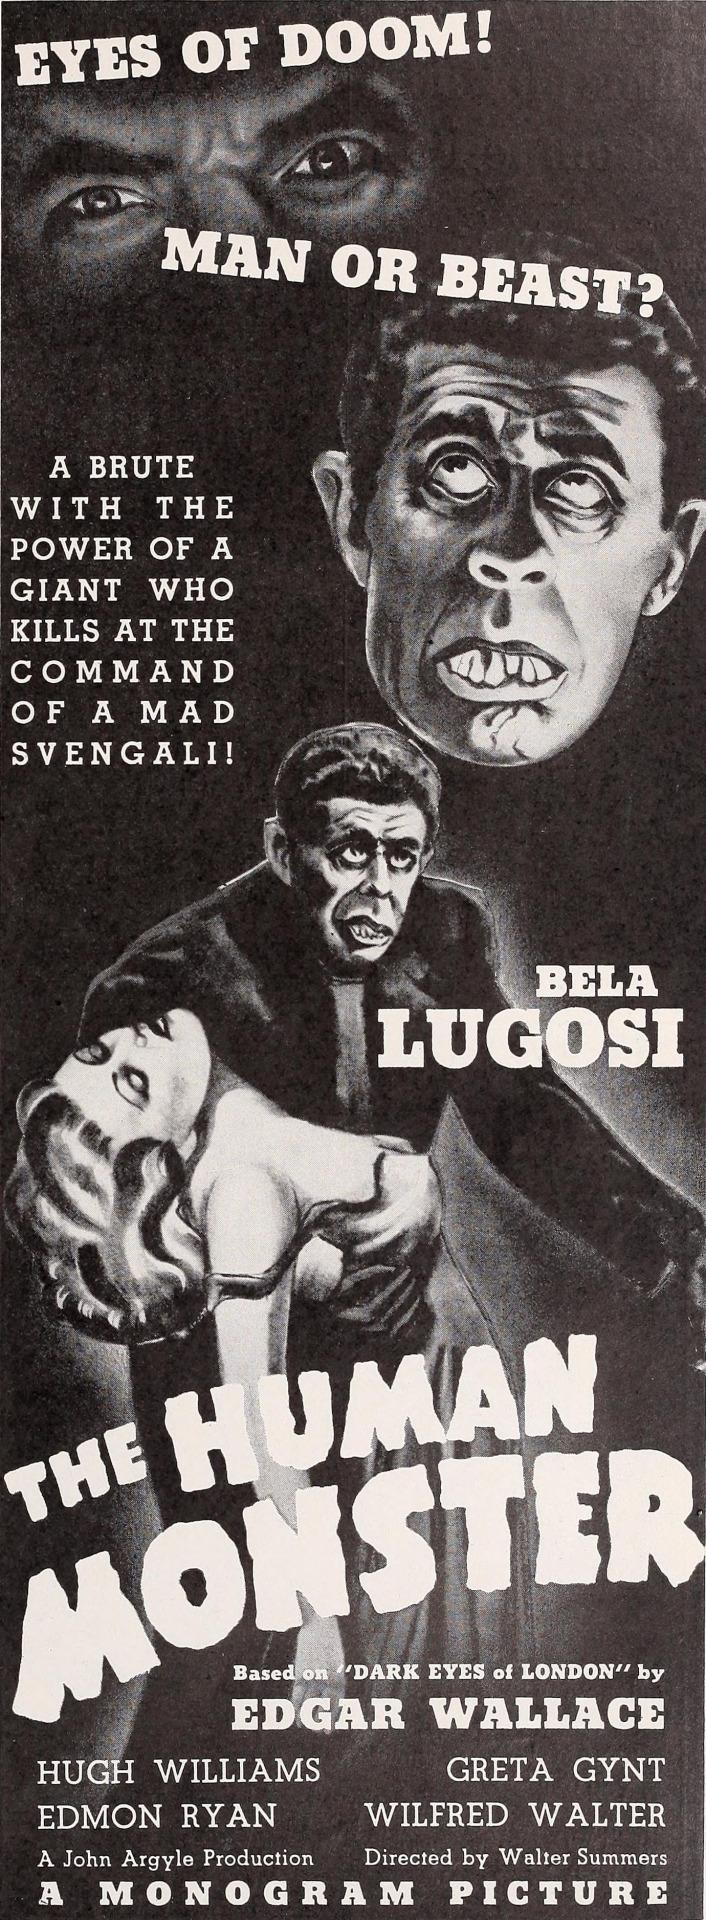 Bela Lugosi, Greta Gynt, and Wilfred Walter in The Dark Eyes of London (1939)